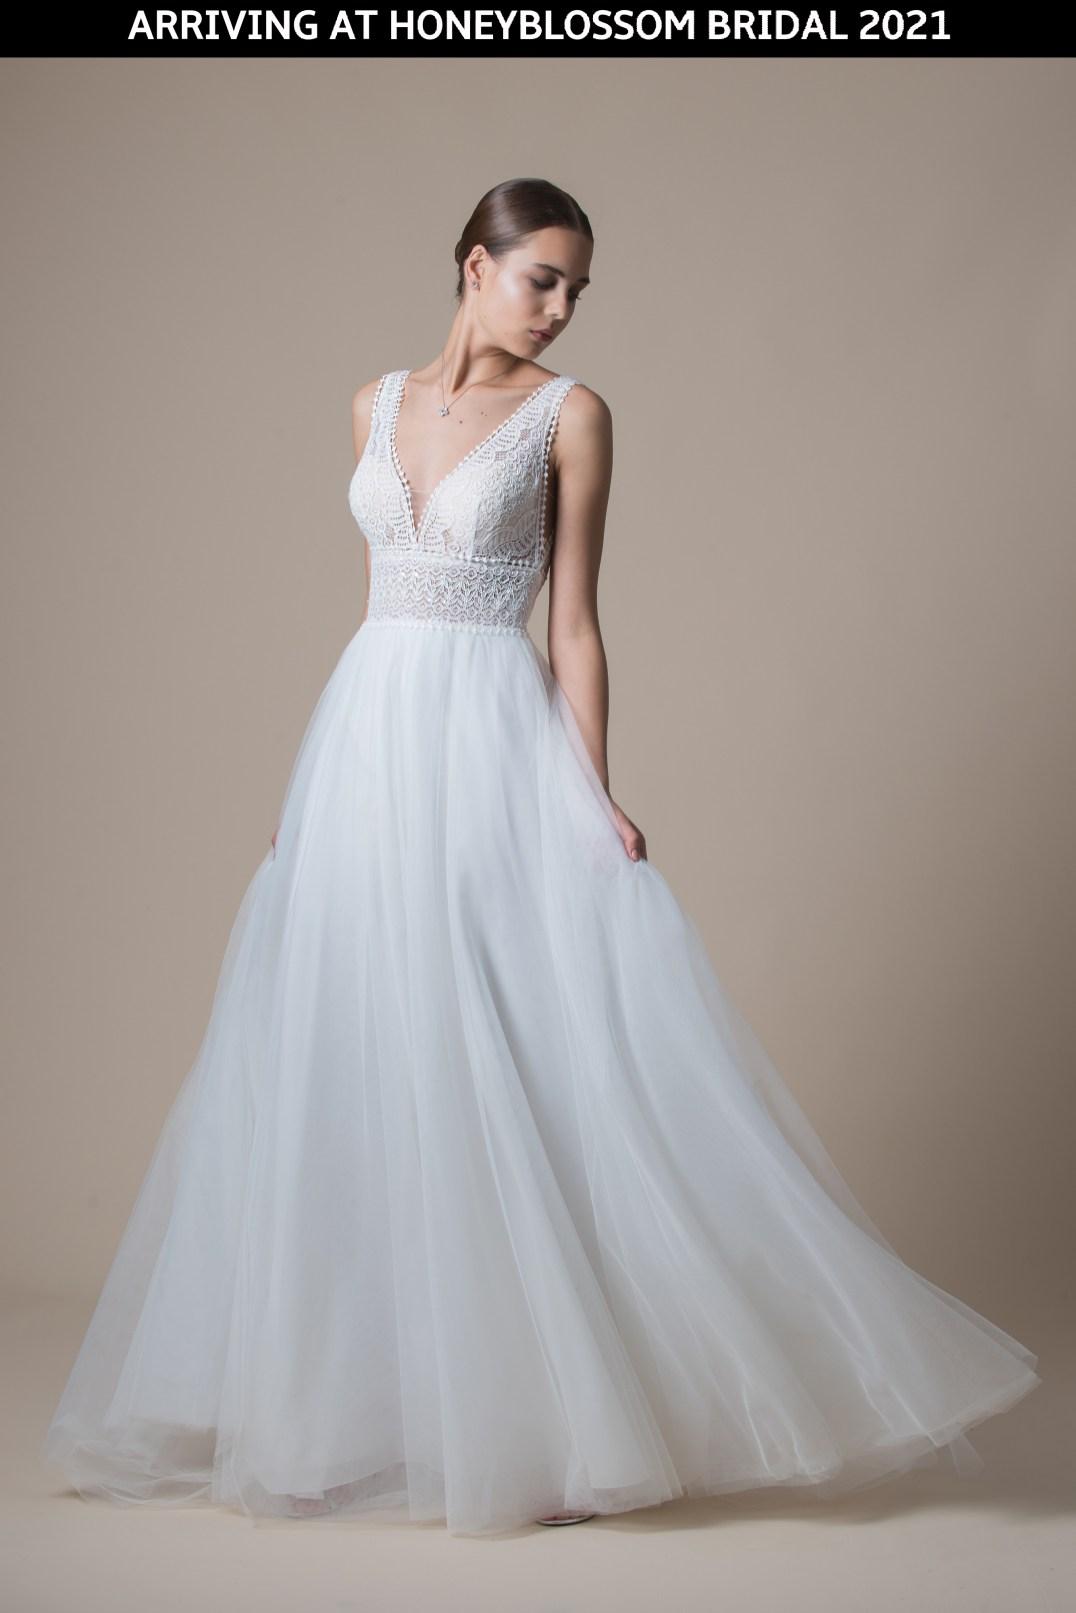 MiaMia McKenzie wedding dress arriving soon to Honeyblossom Bridal